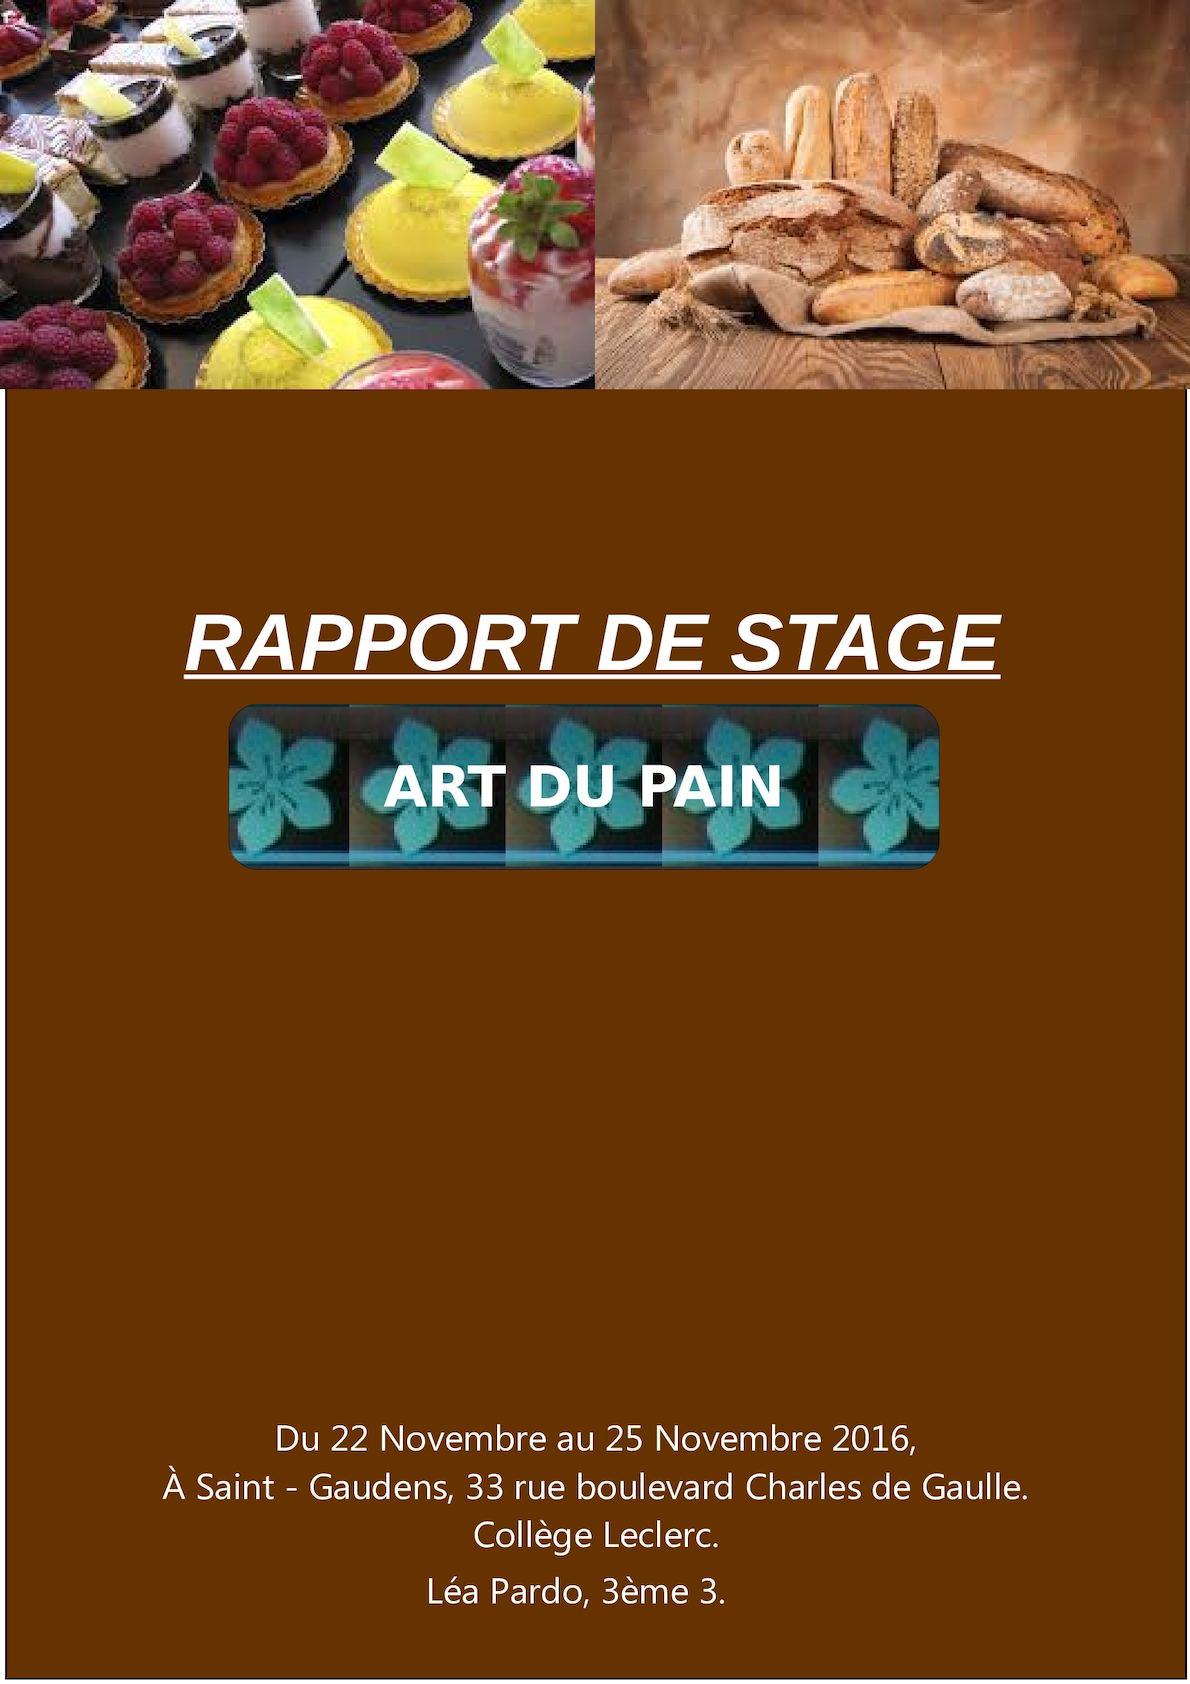 Calaméo Léa Pardo Rapport De Stage